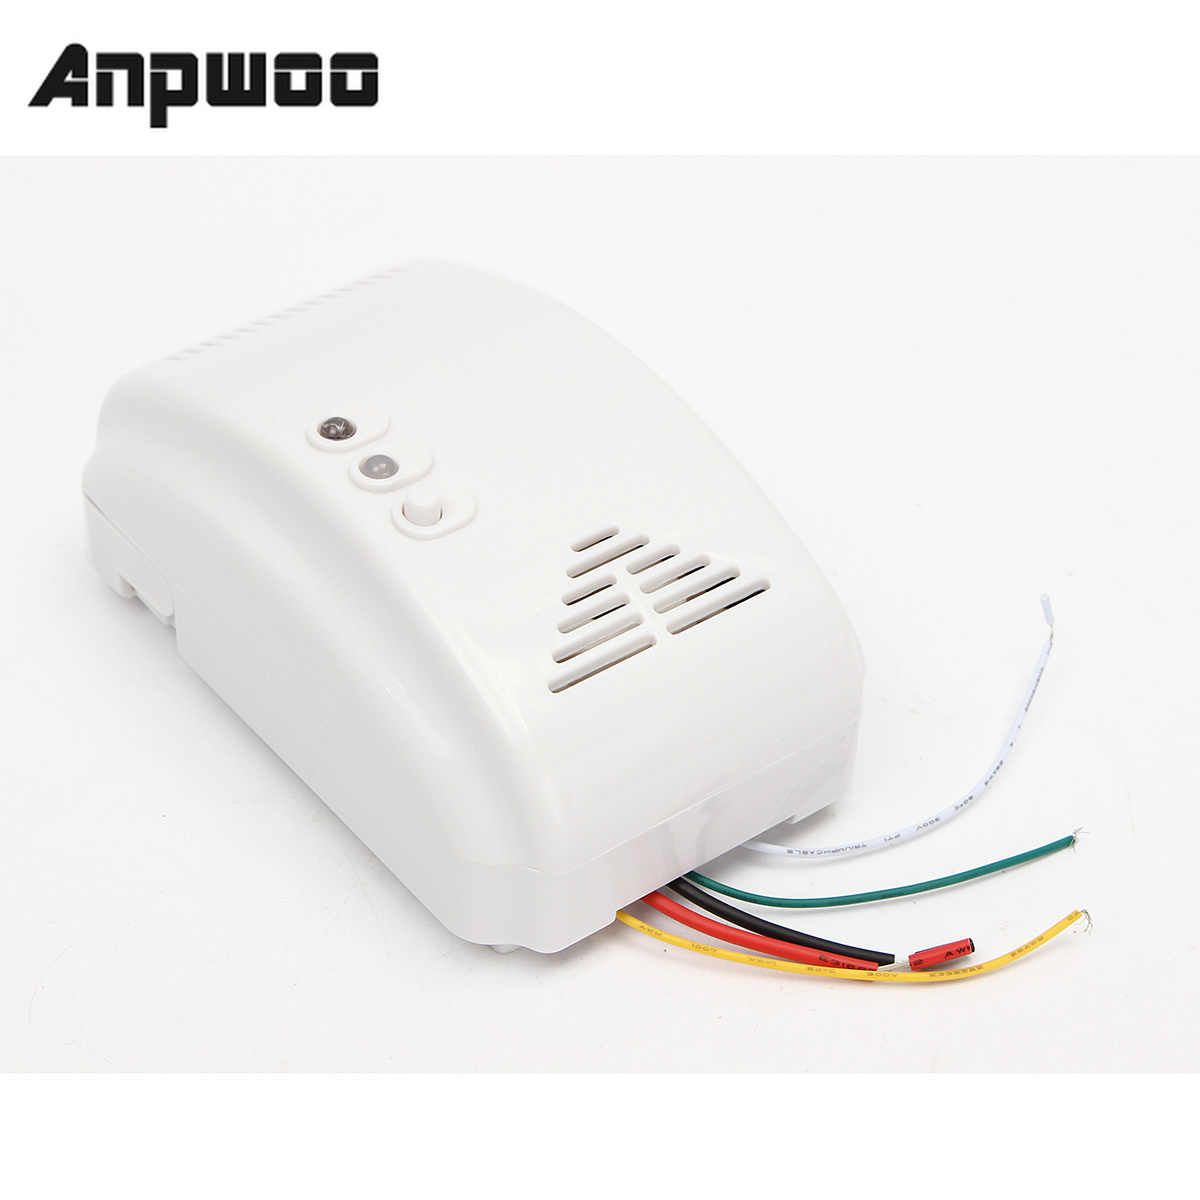 12V Gas Detector Sensor Alarm Propane Butane LPG Natural Motor Home Camper